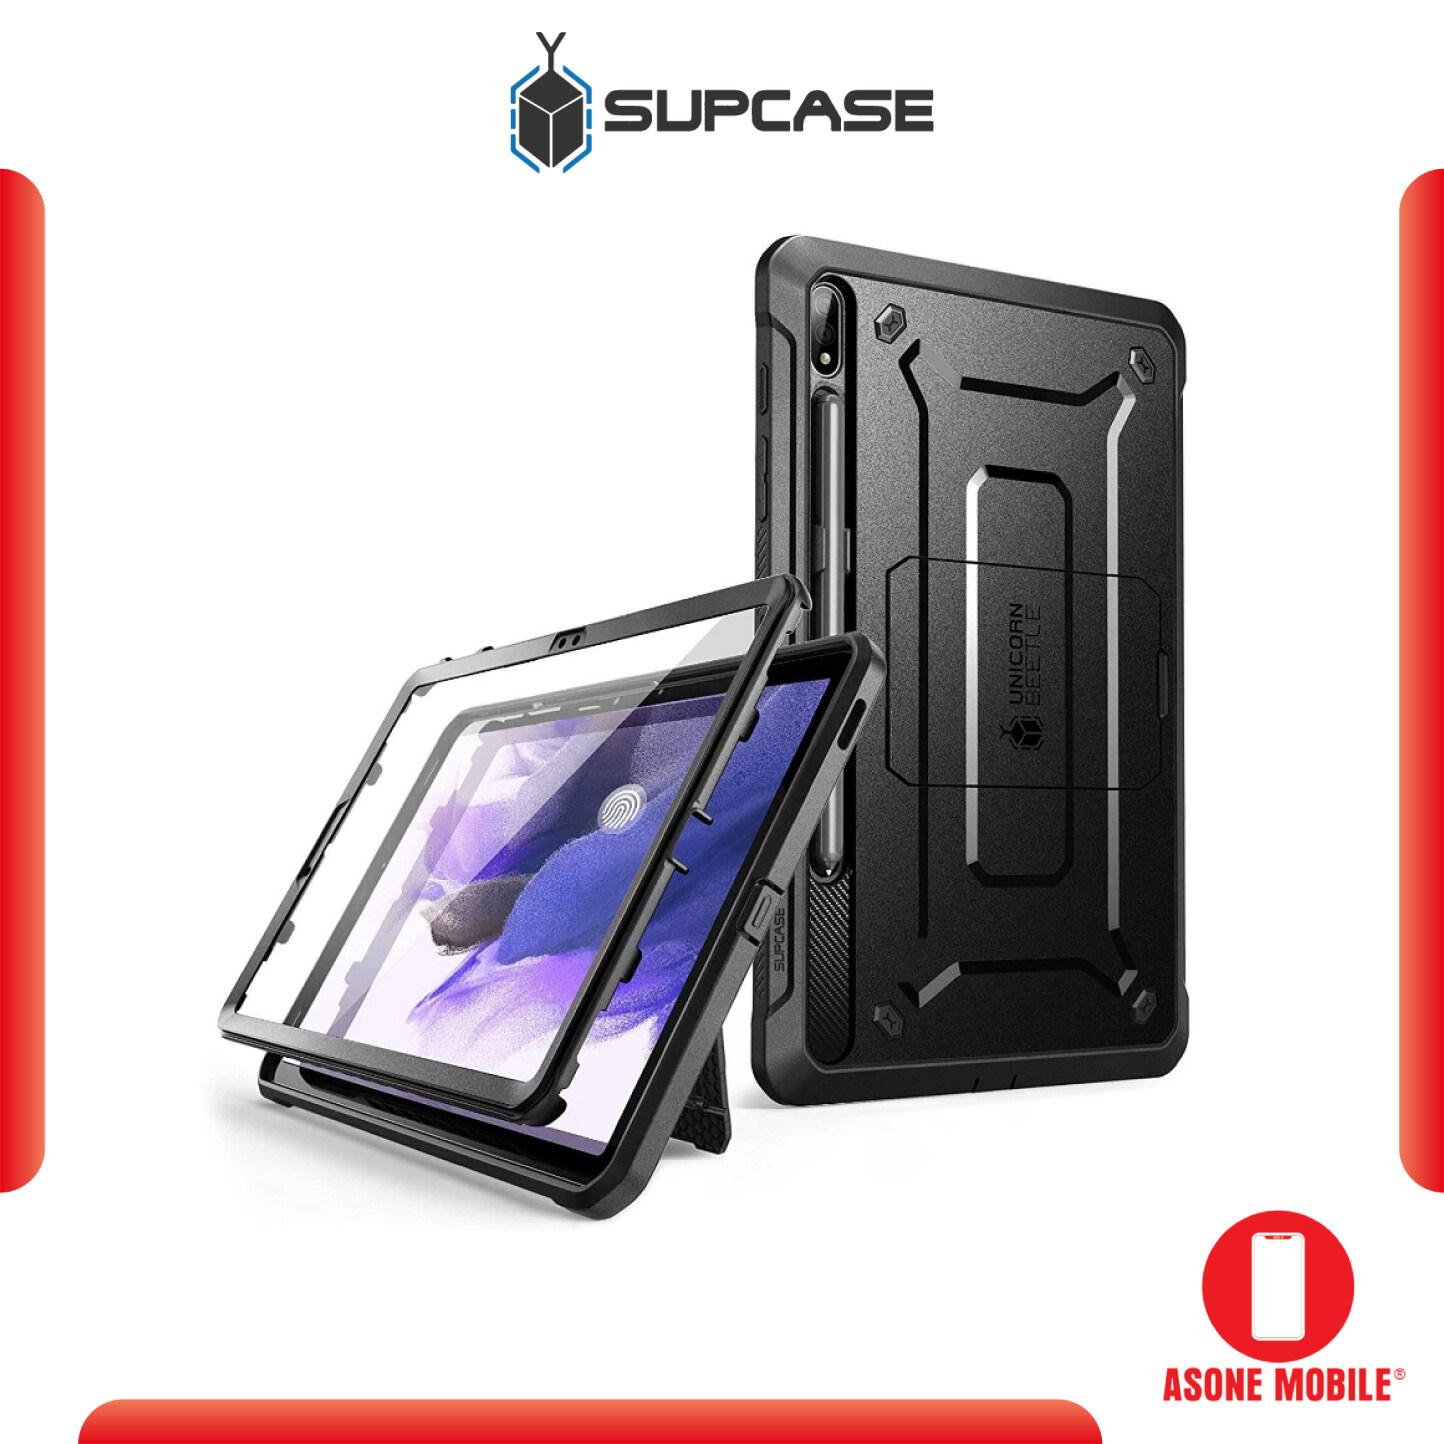 Original SUPCASE Galaxy Tab S7 FE 12.4 inch (2021) Unicorn Beetle Pro Rugged Case - Black